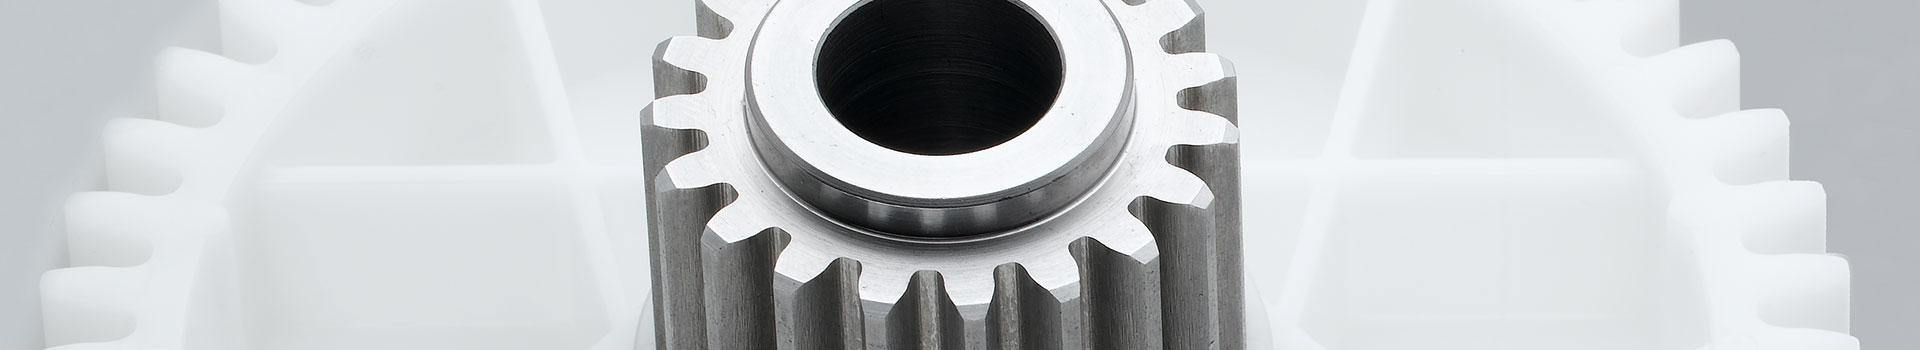 Kunststoff Metall Verbindung